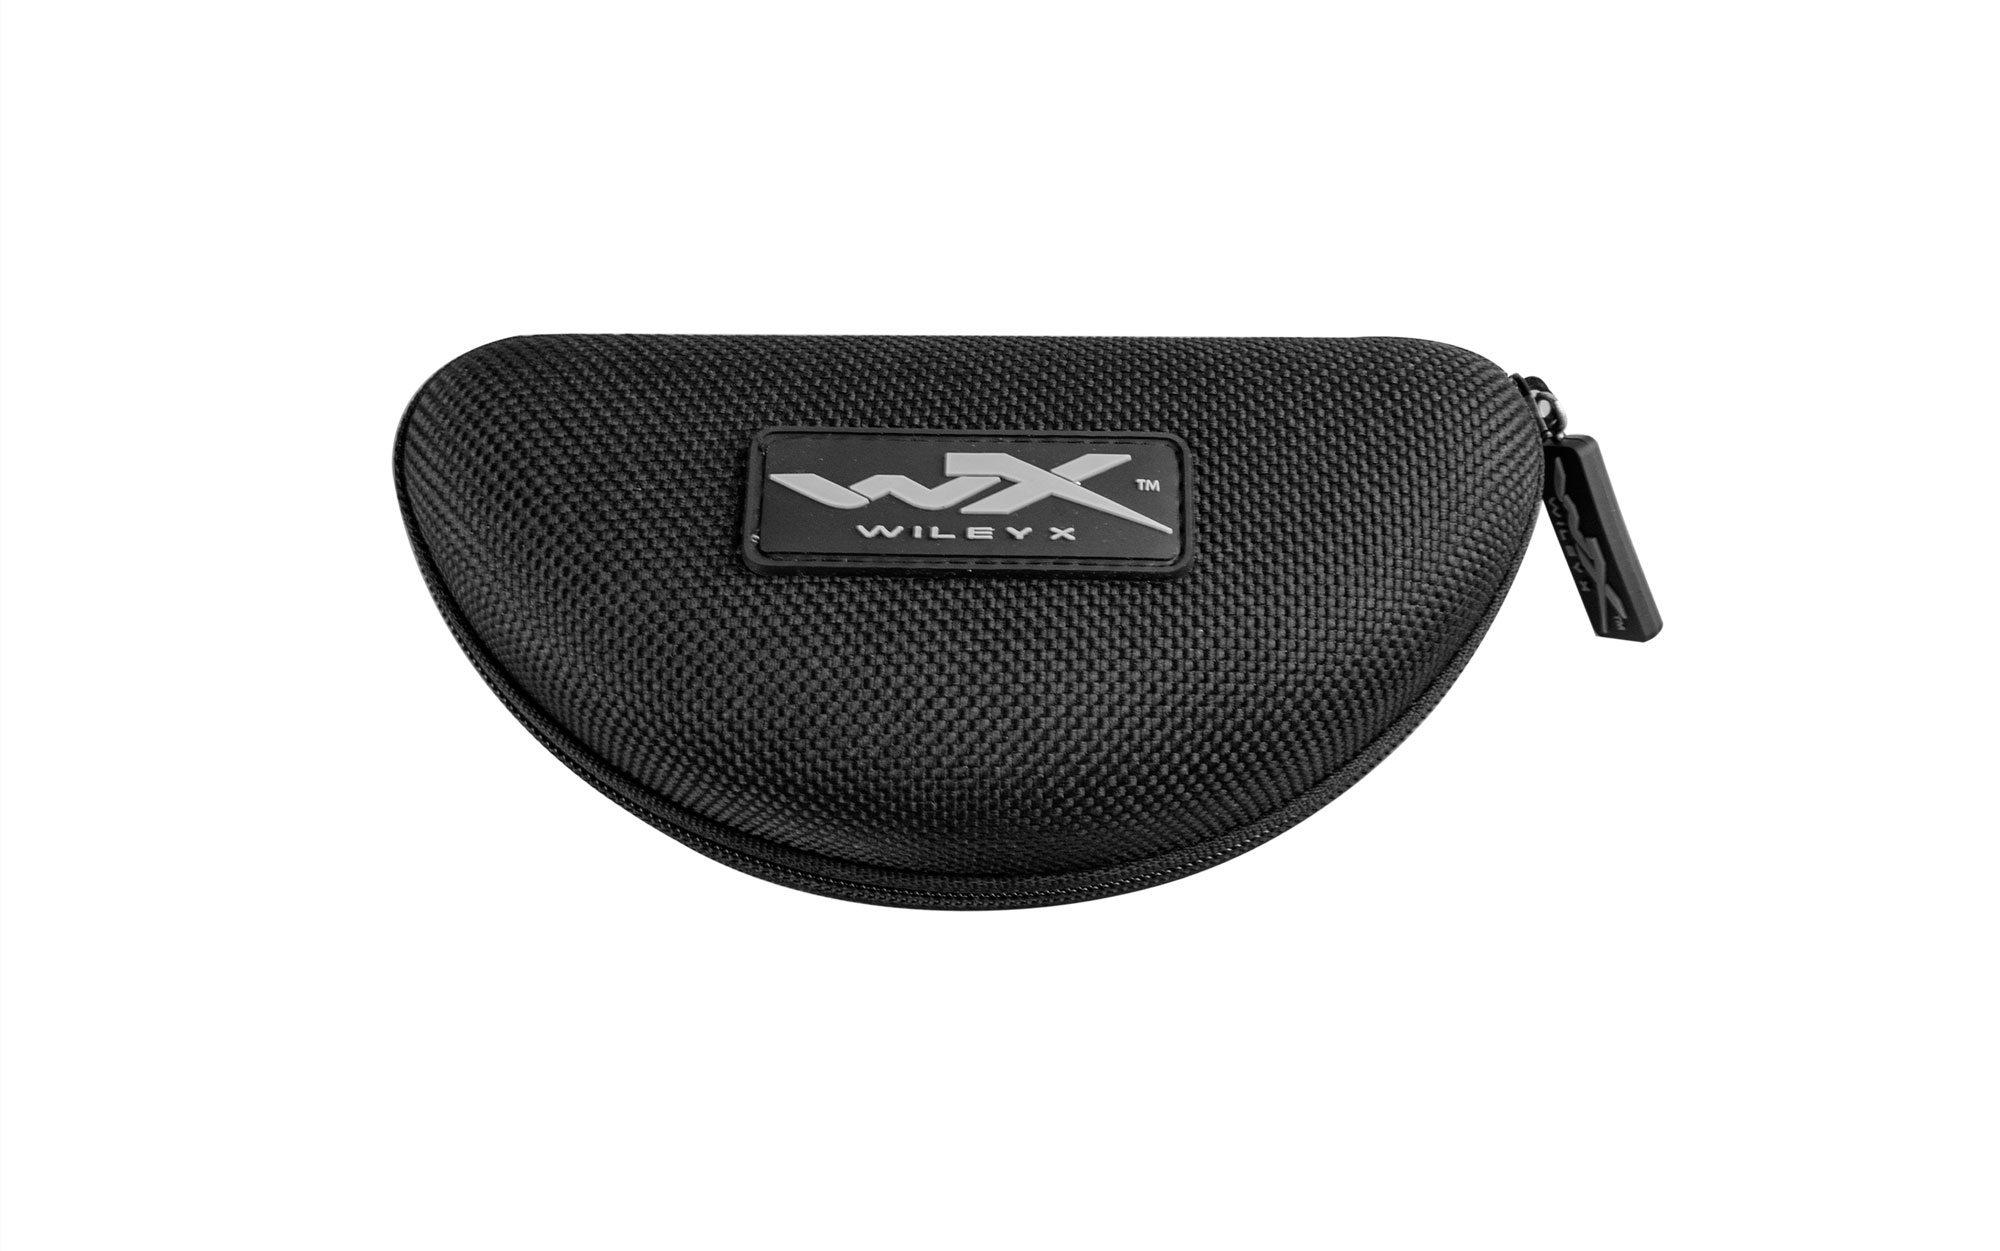 11d46f900a Wiley X Ace